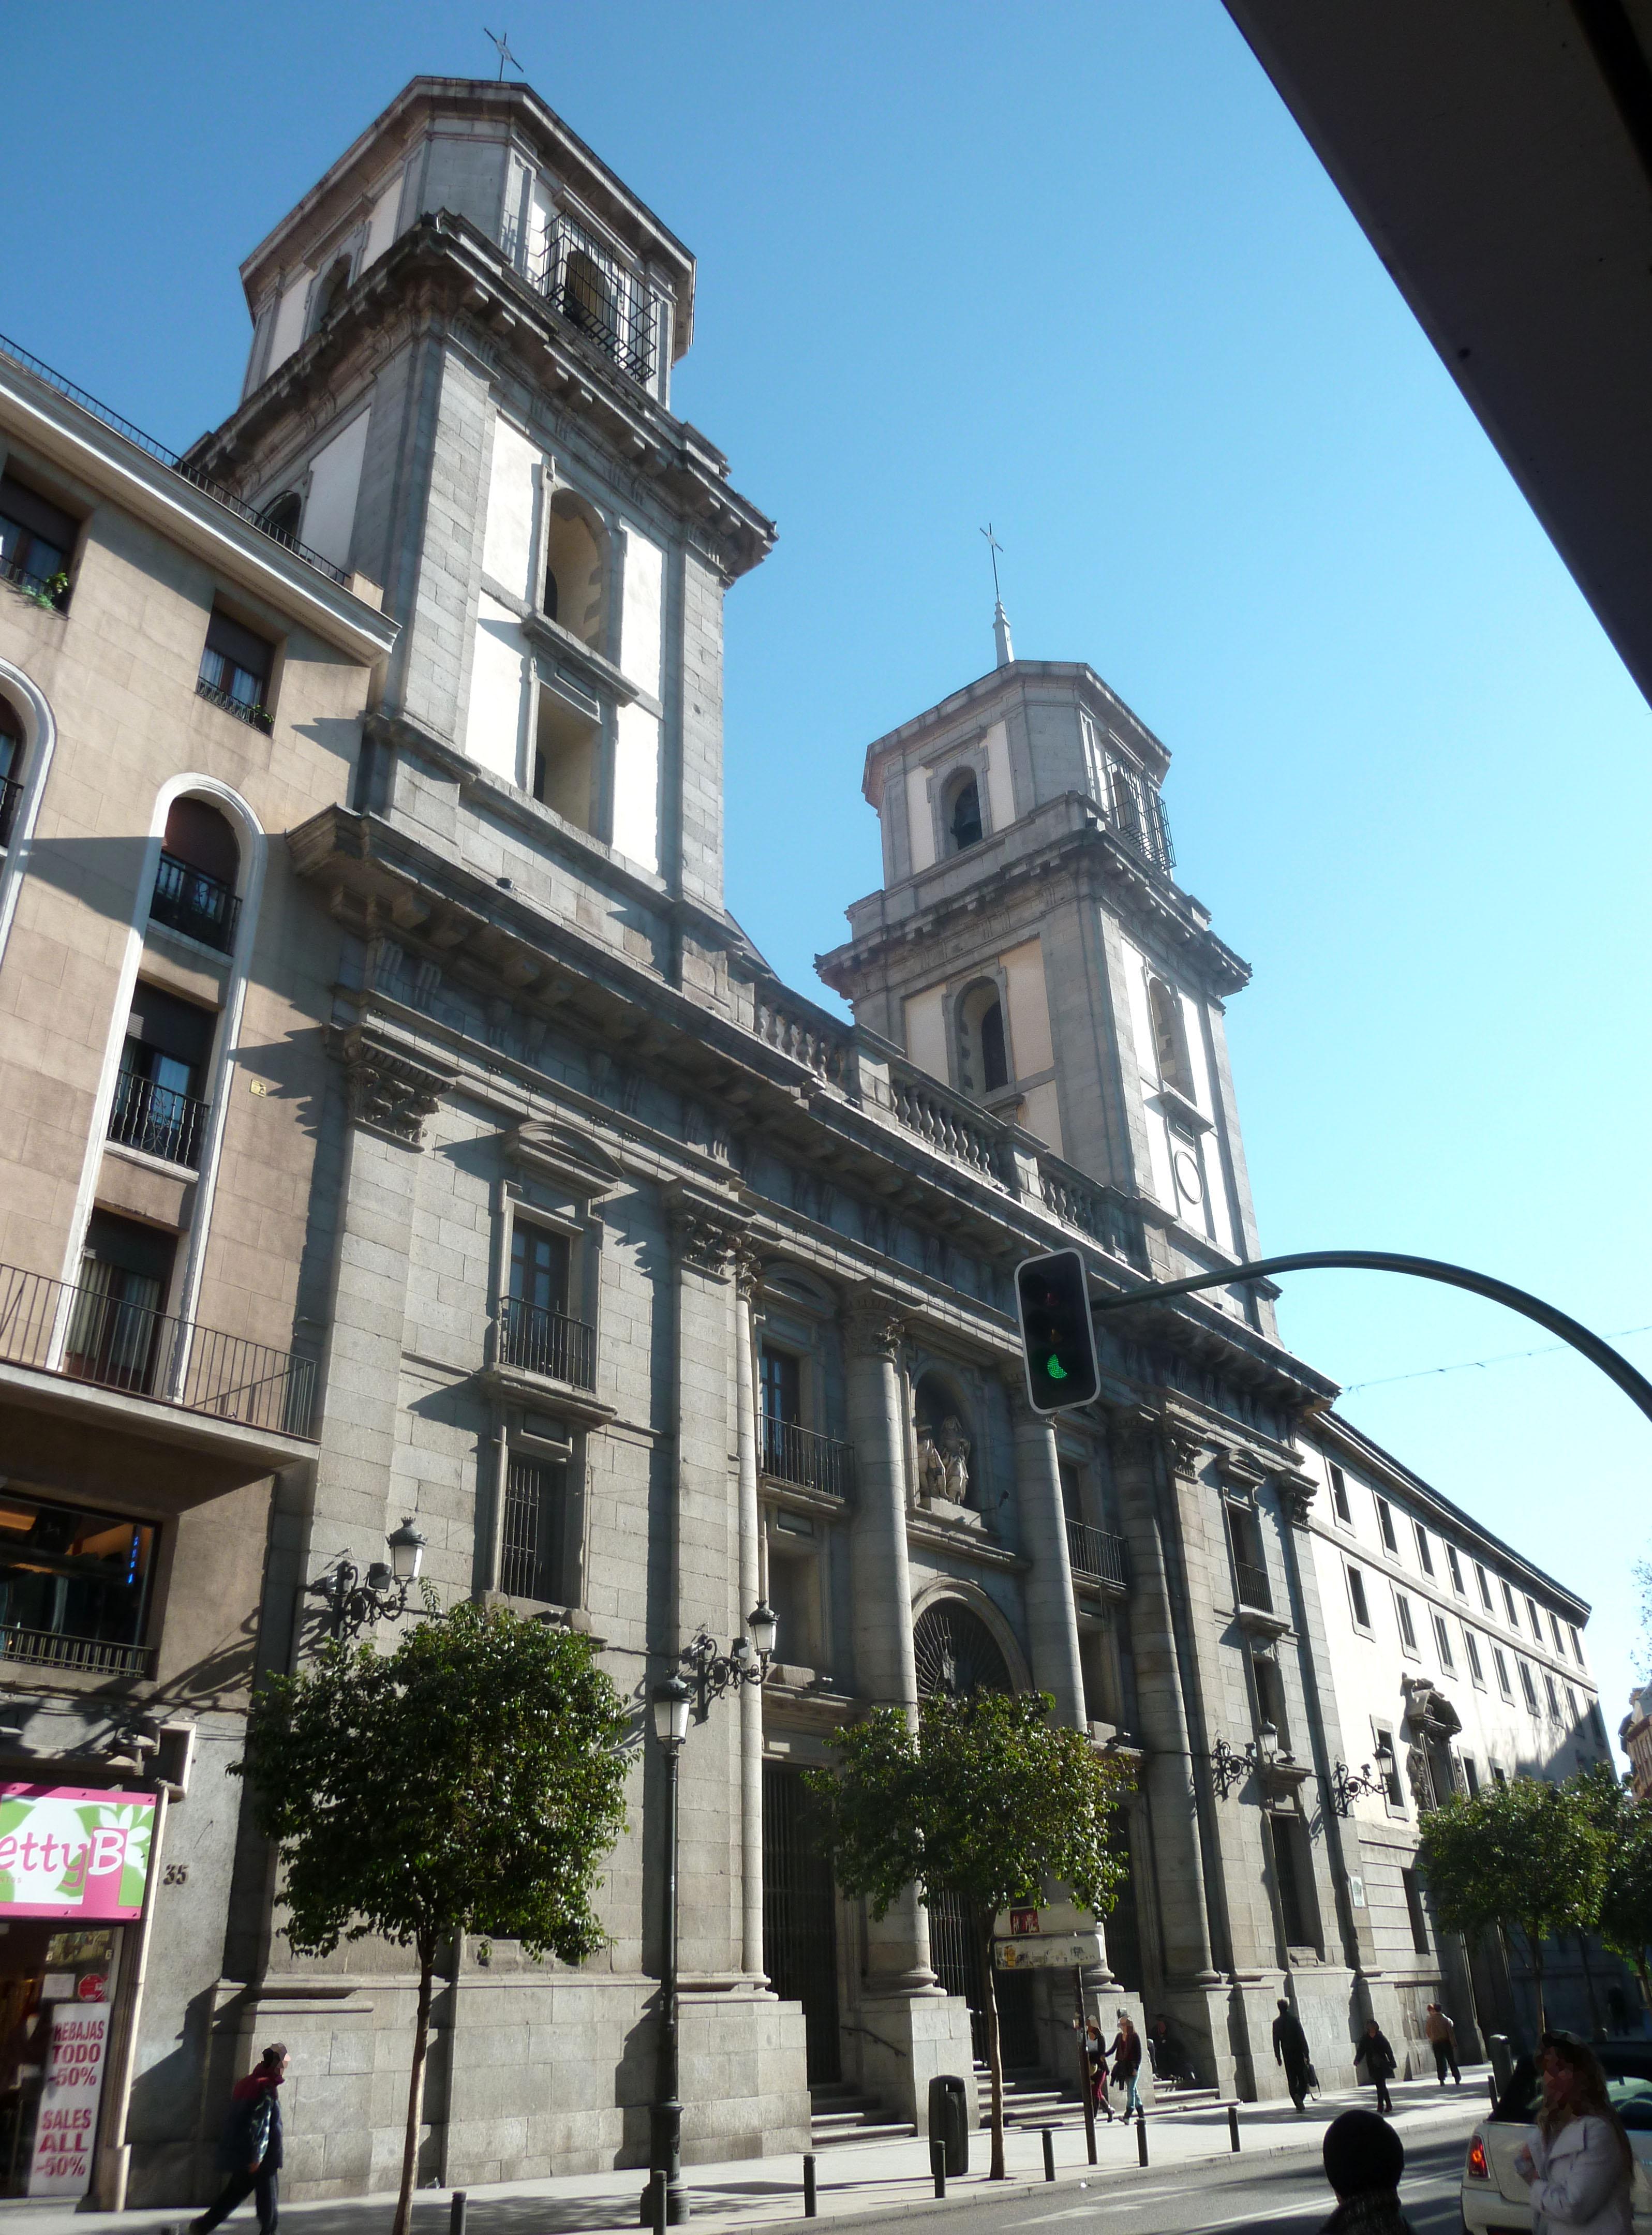 File:Colegiata de San Isidro (Madrid) 10.jpg - Wikimedia Commons